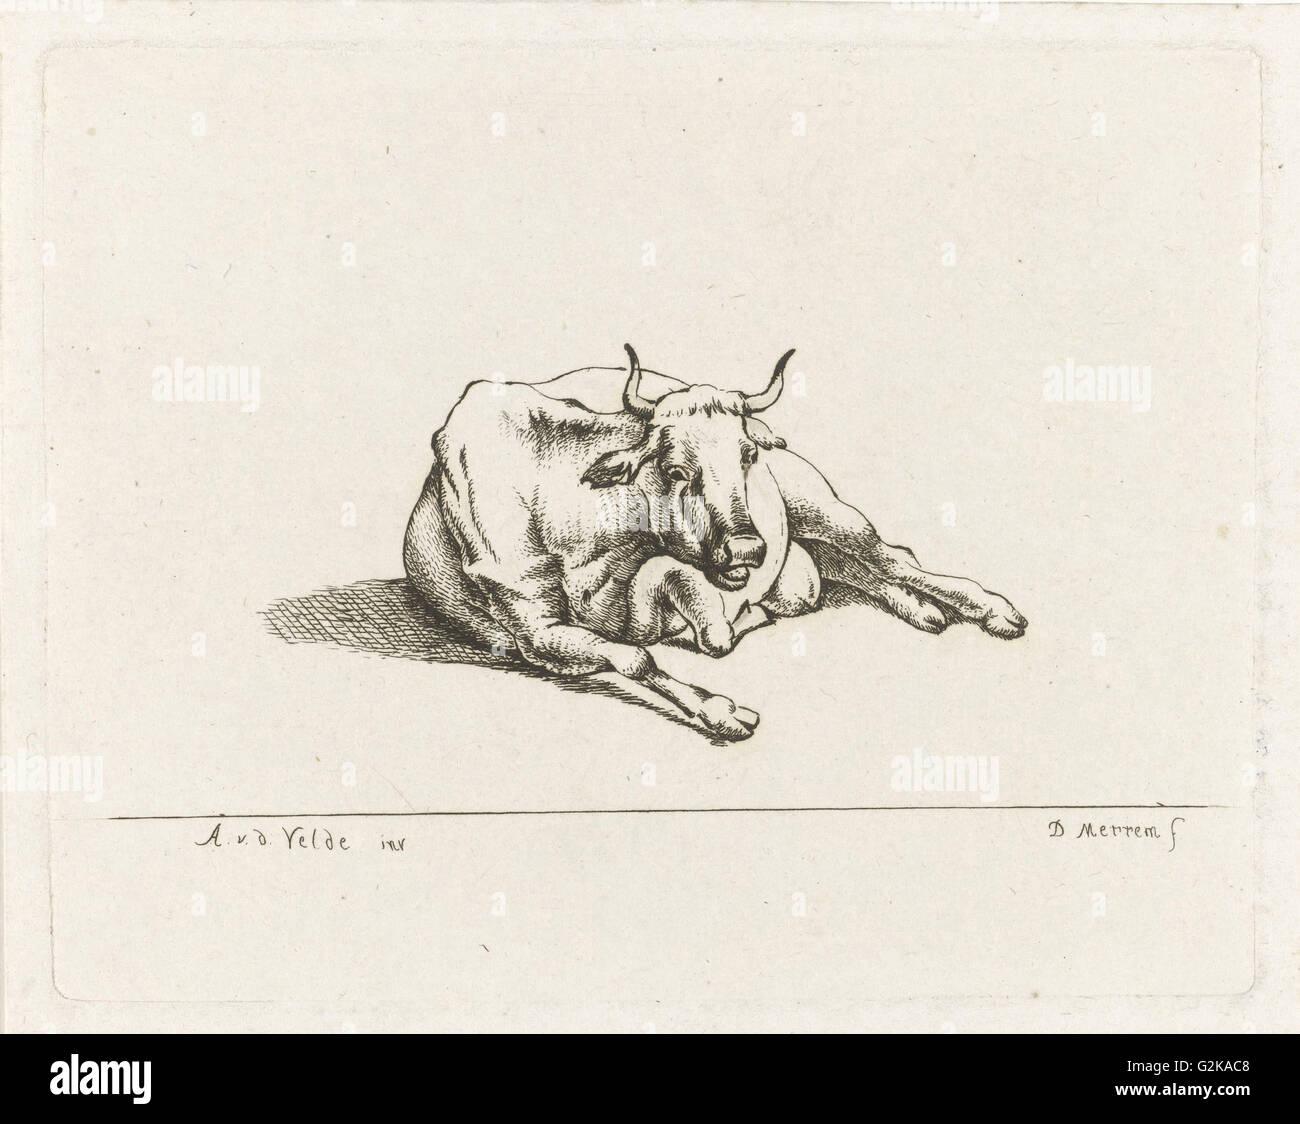 Lying cow, D. Merrem, 1700 - 1800 - Stock Image